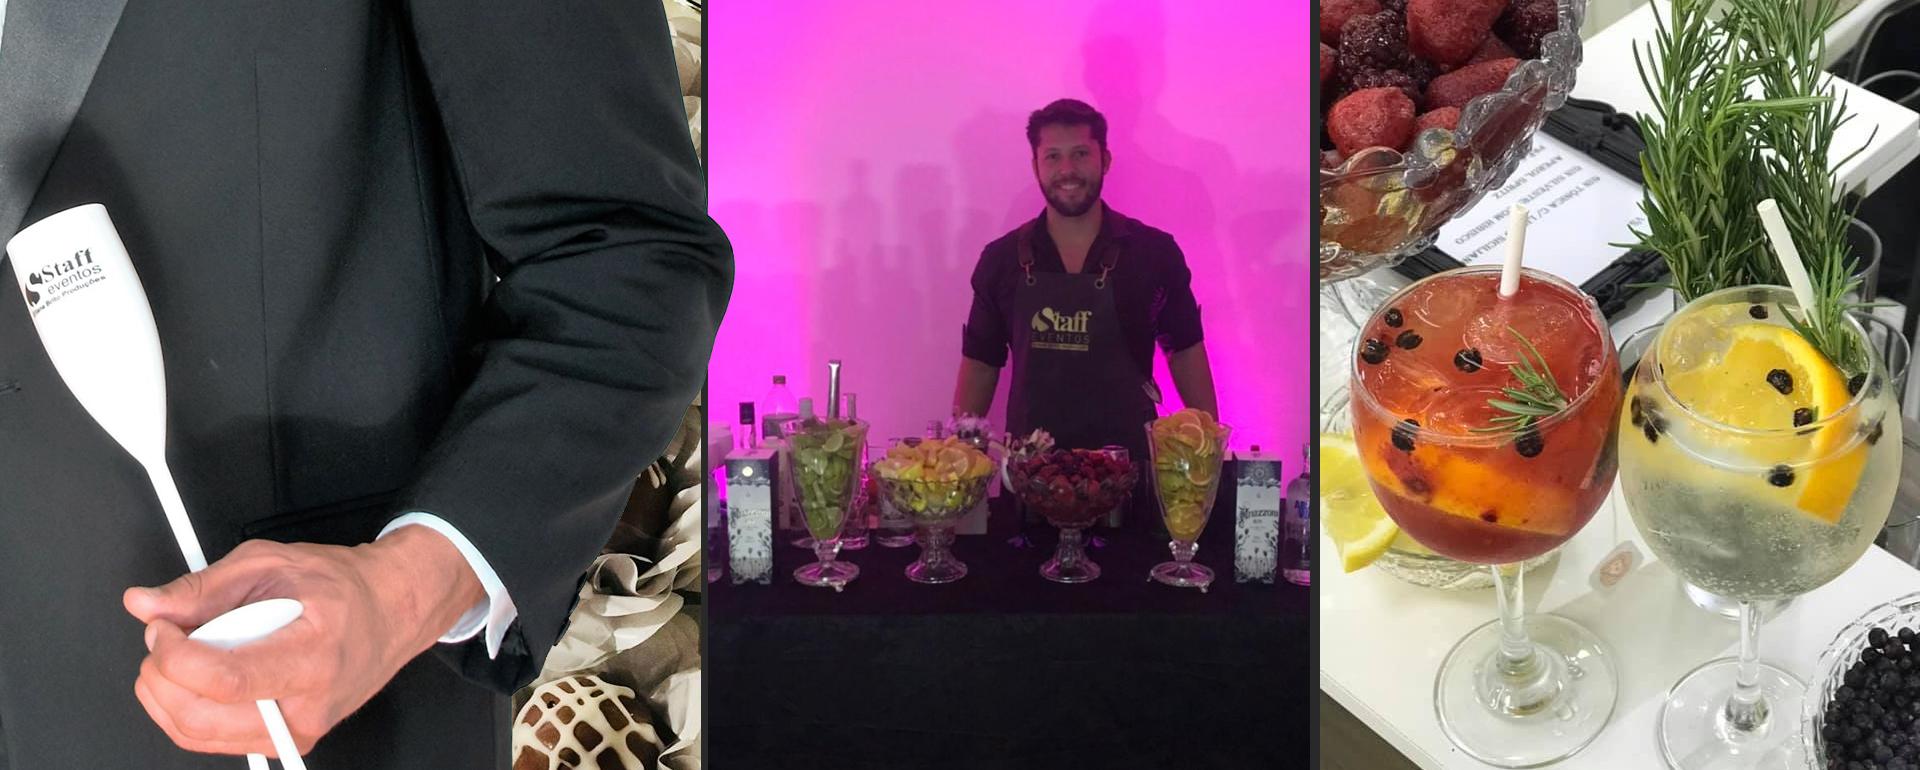 Buffet + Melhor Open Bar do Rio